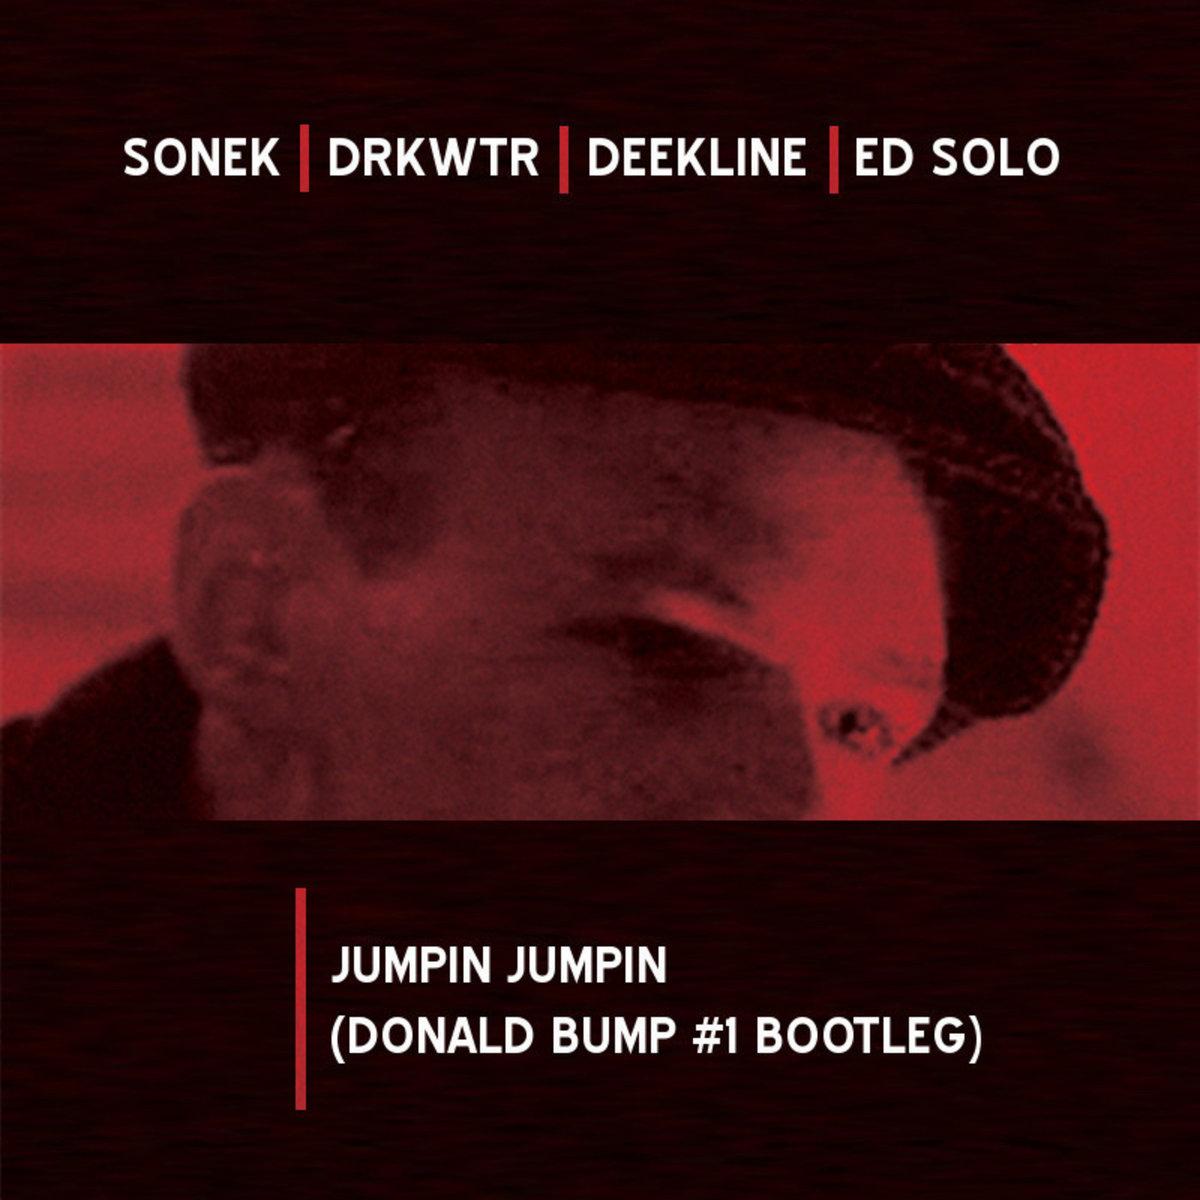 Sonek X DRKWTR X Deekline X Ed Solo - Jumpin Jumpin (Donald